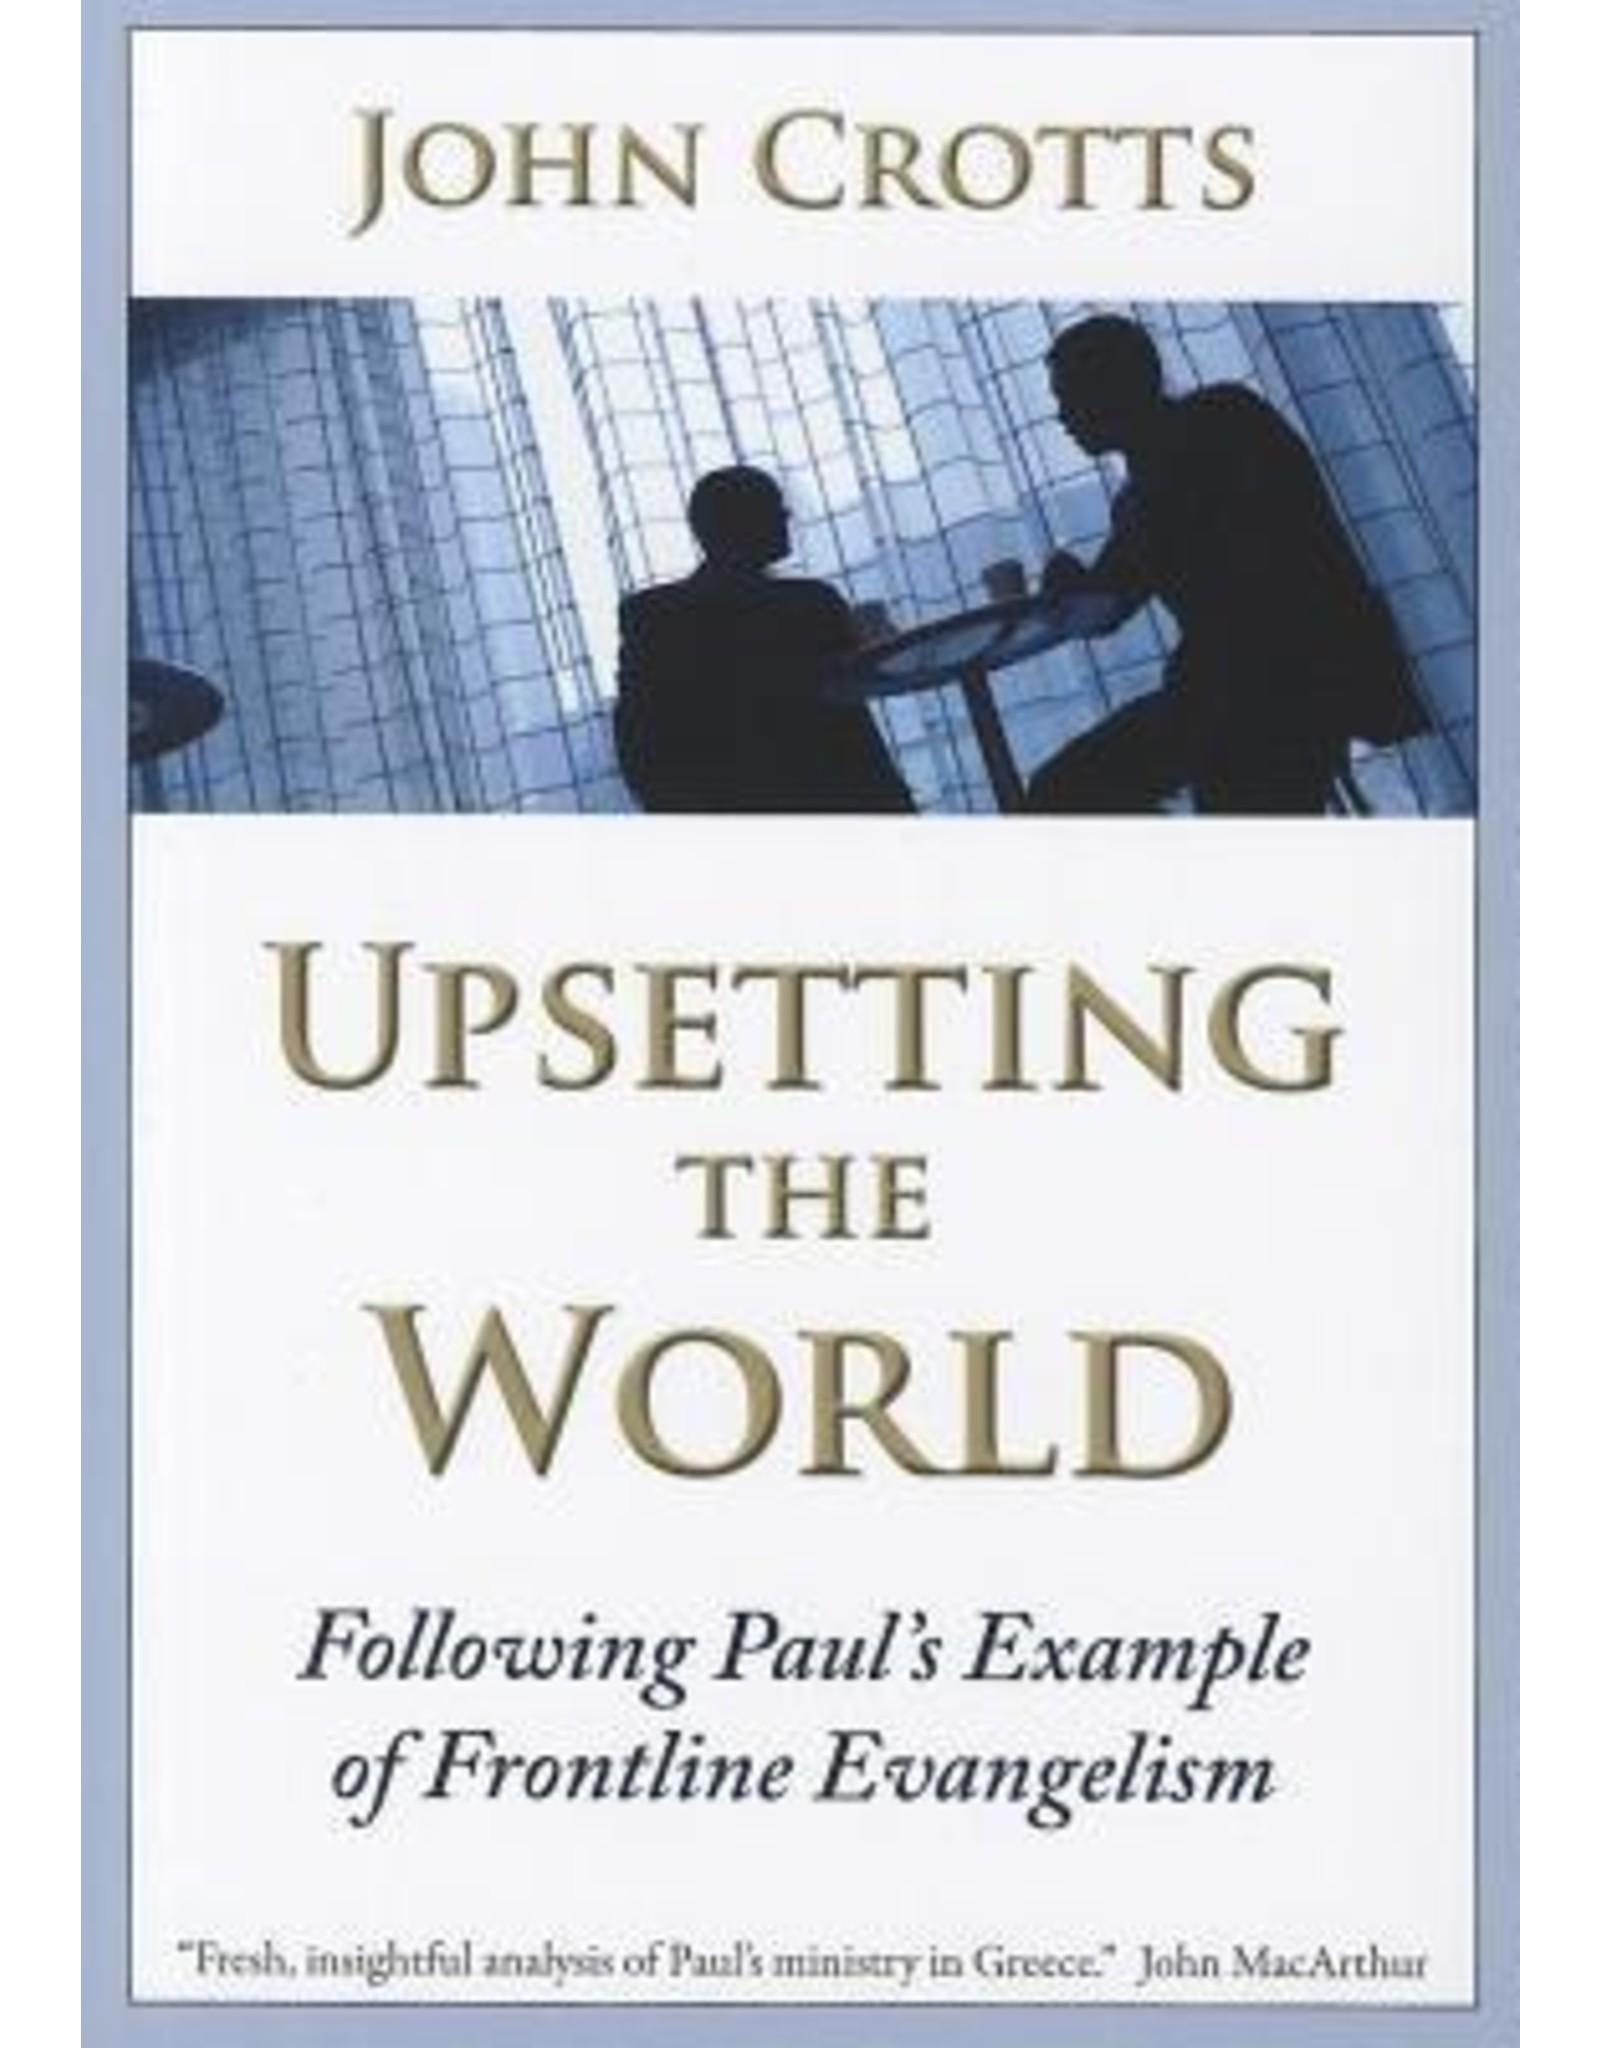 Crotts Upsetting the World